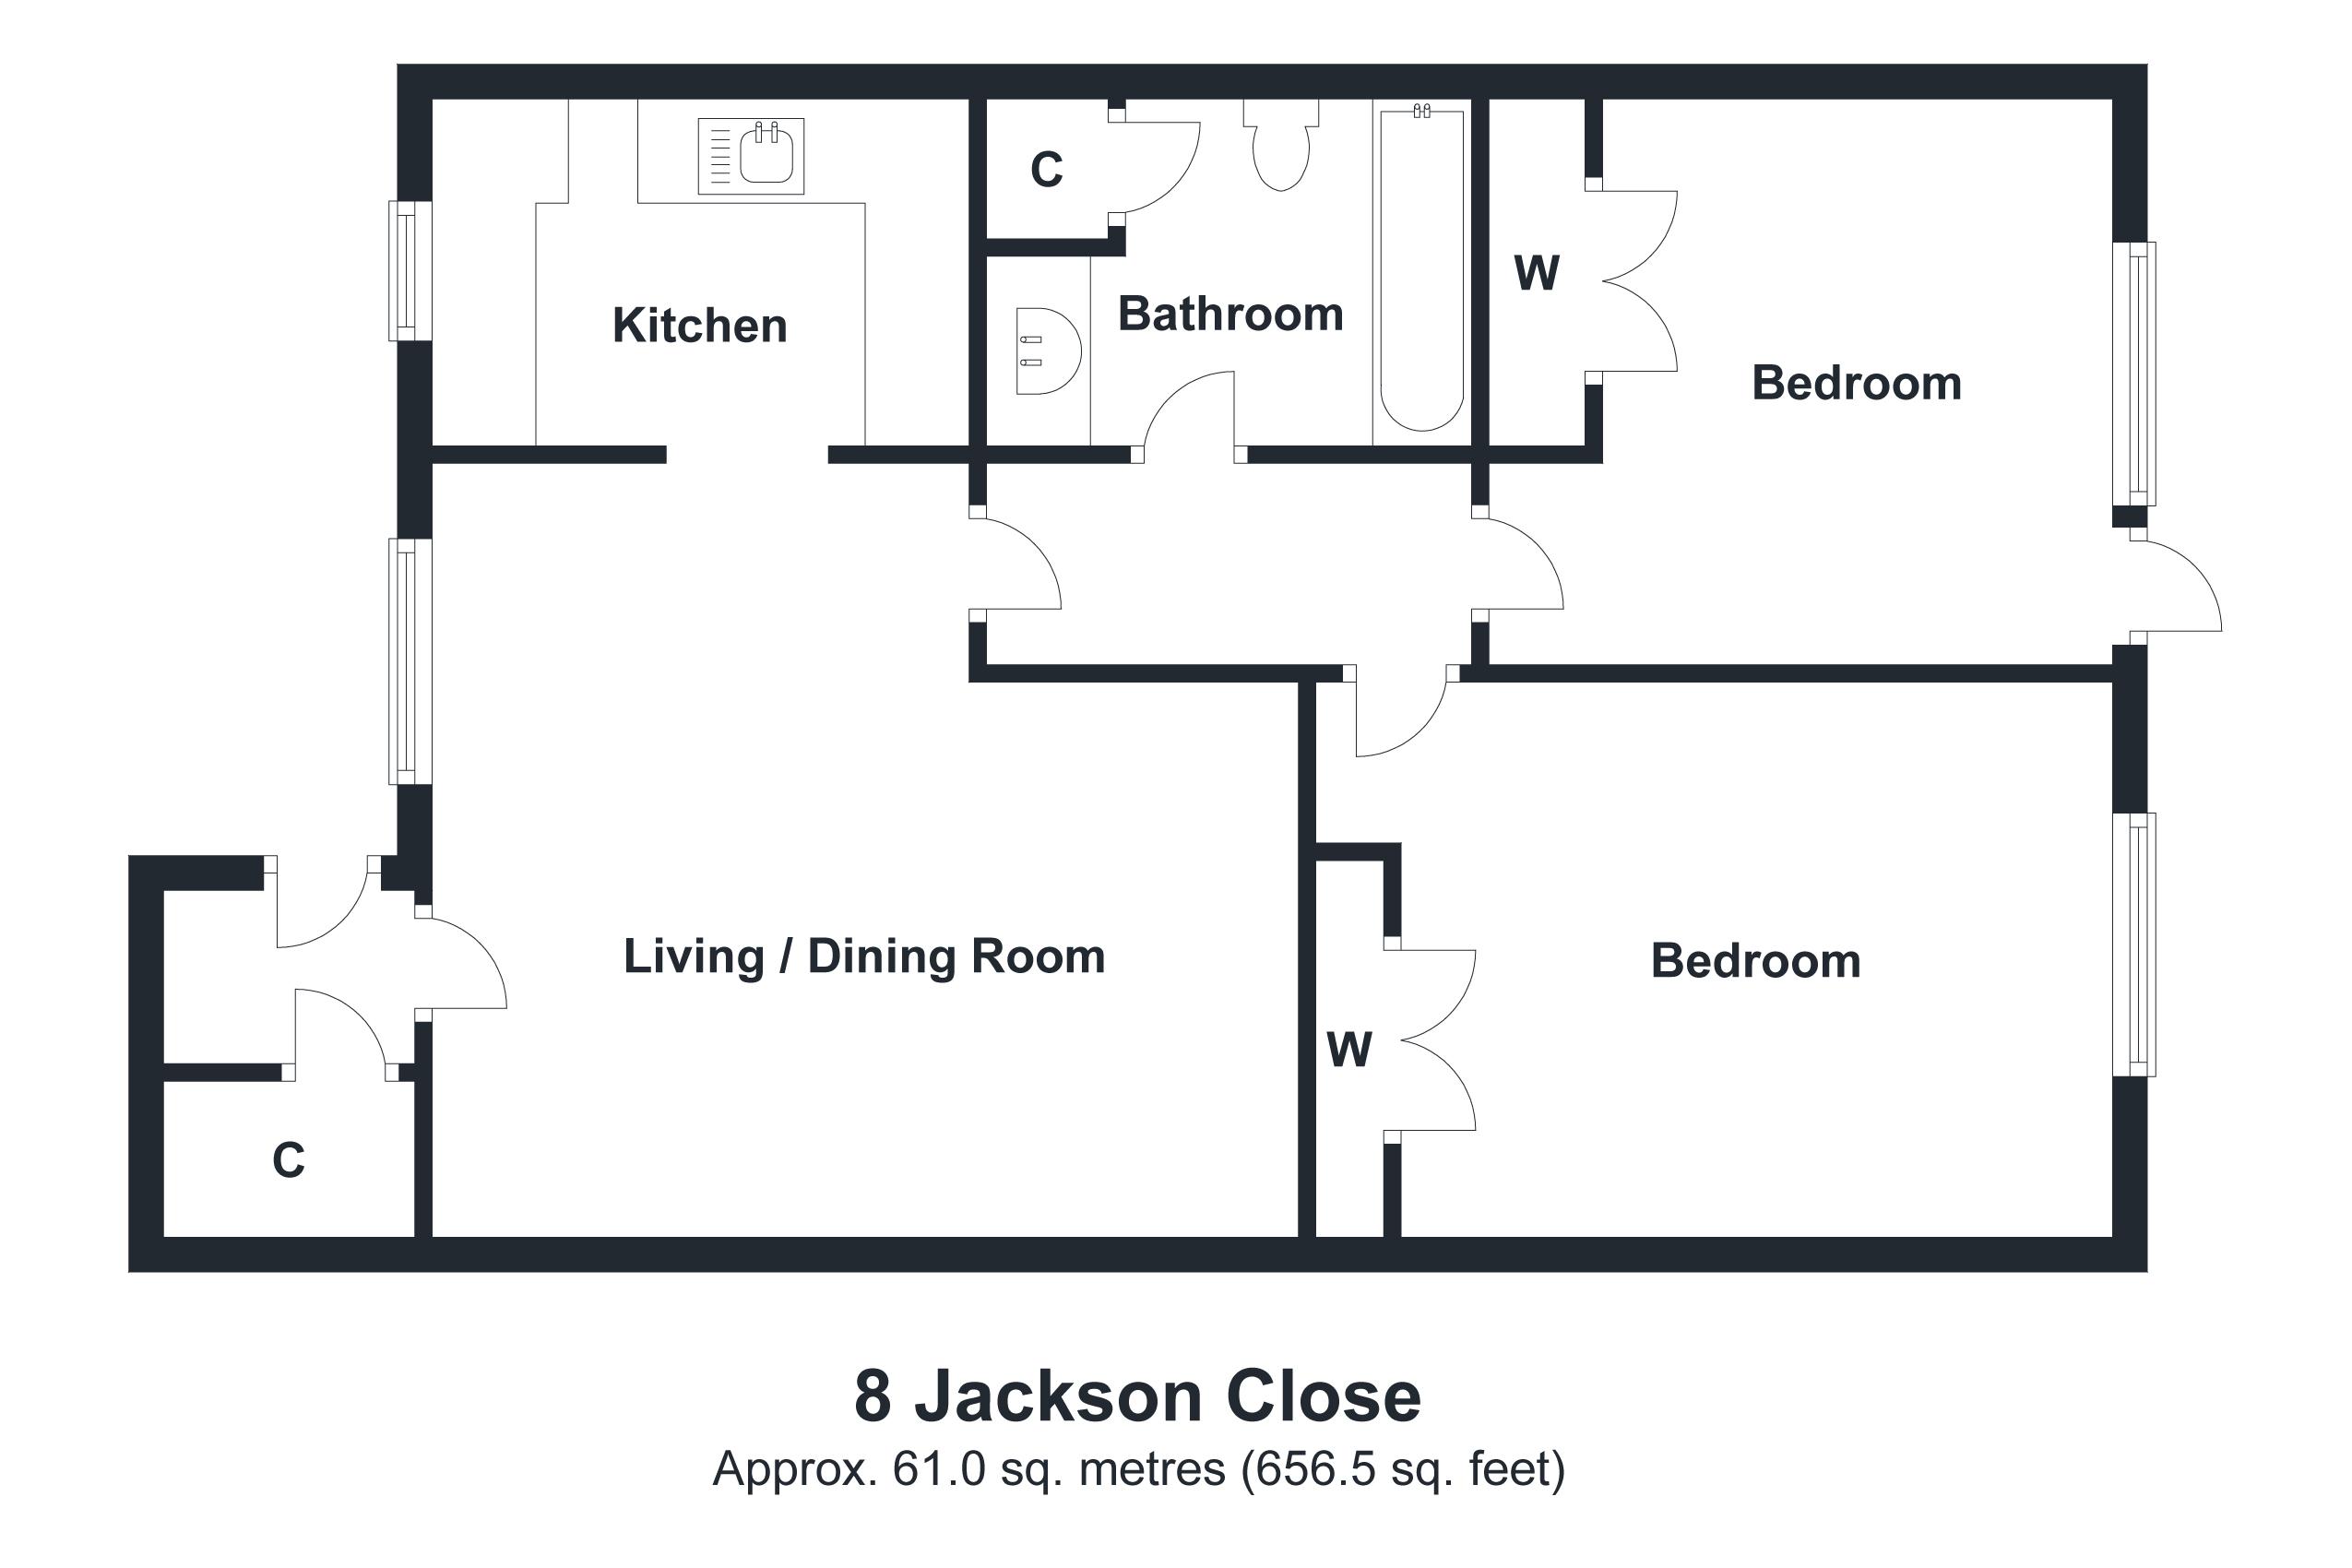 8 Jackson Close Floorplan